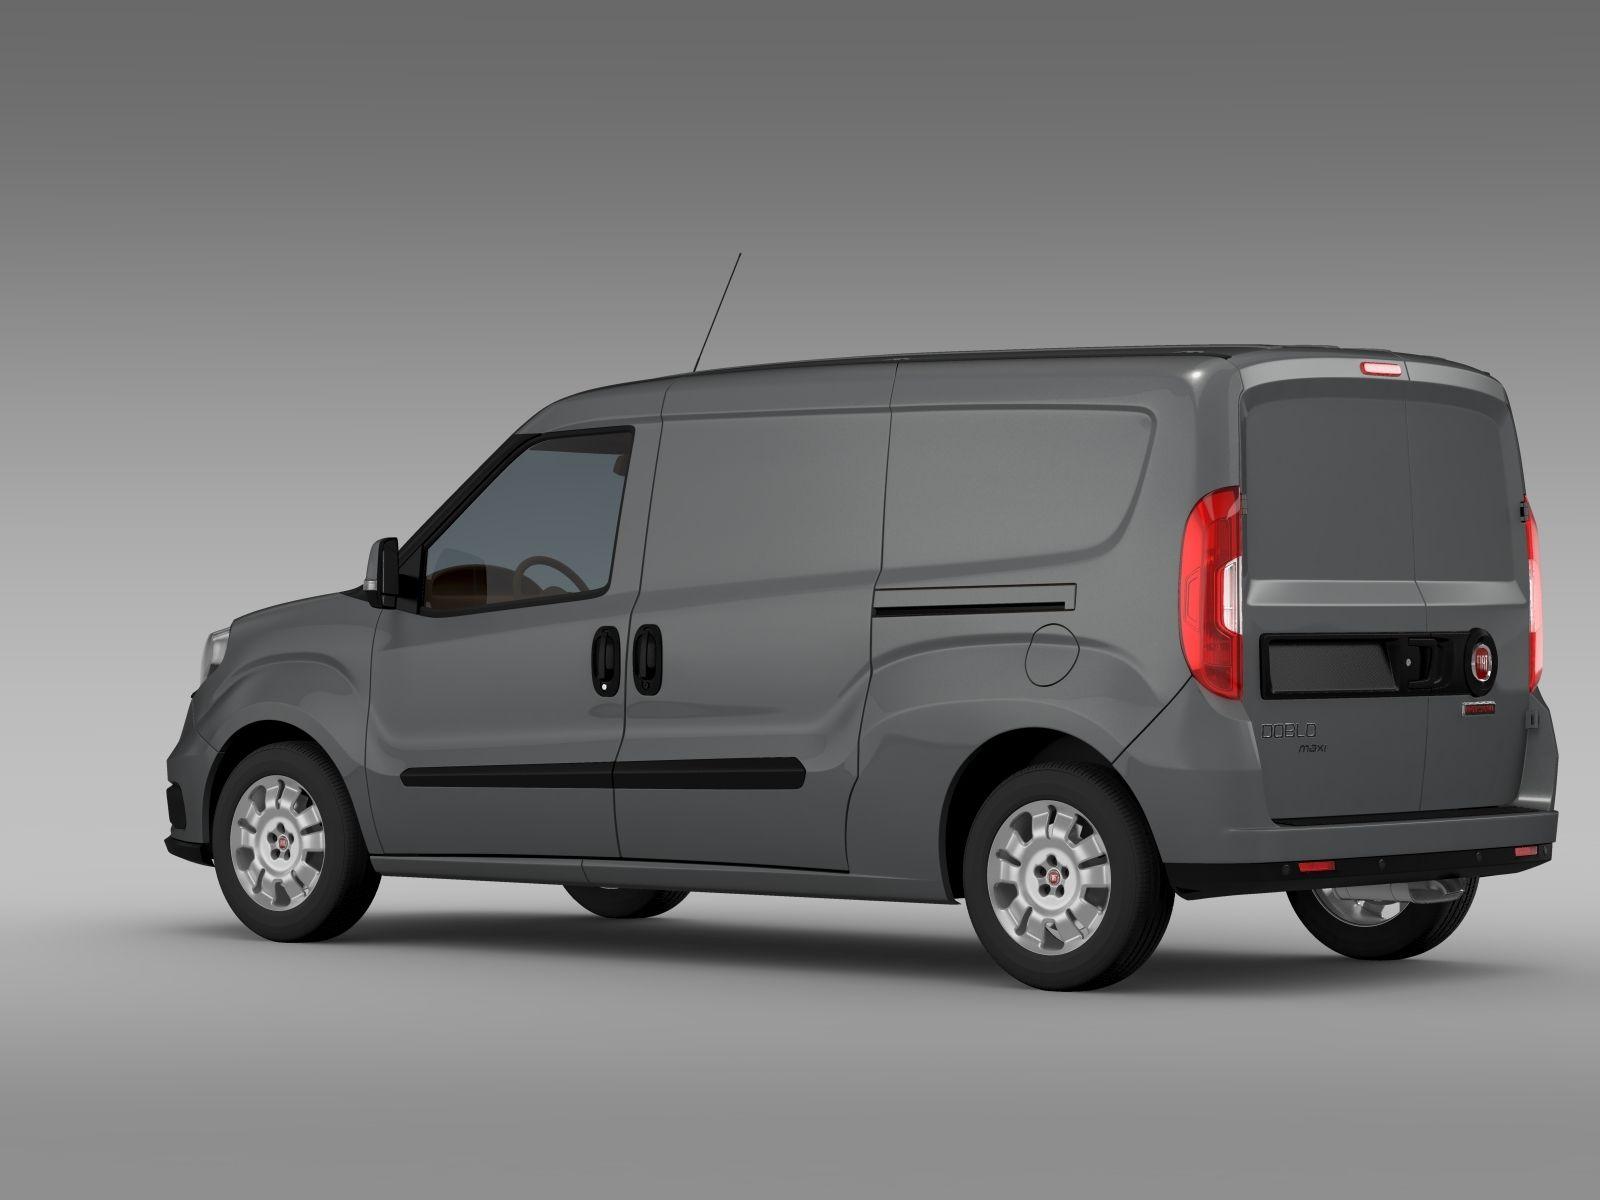 Fiat Doblo Cargo Maxi 263 2015 With Images Fiat Doblo Fiat Cargo